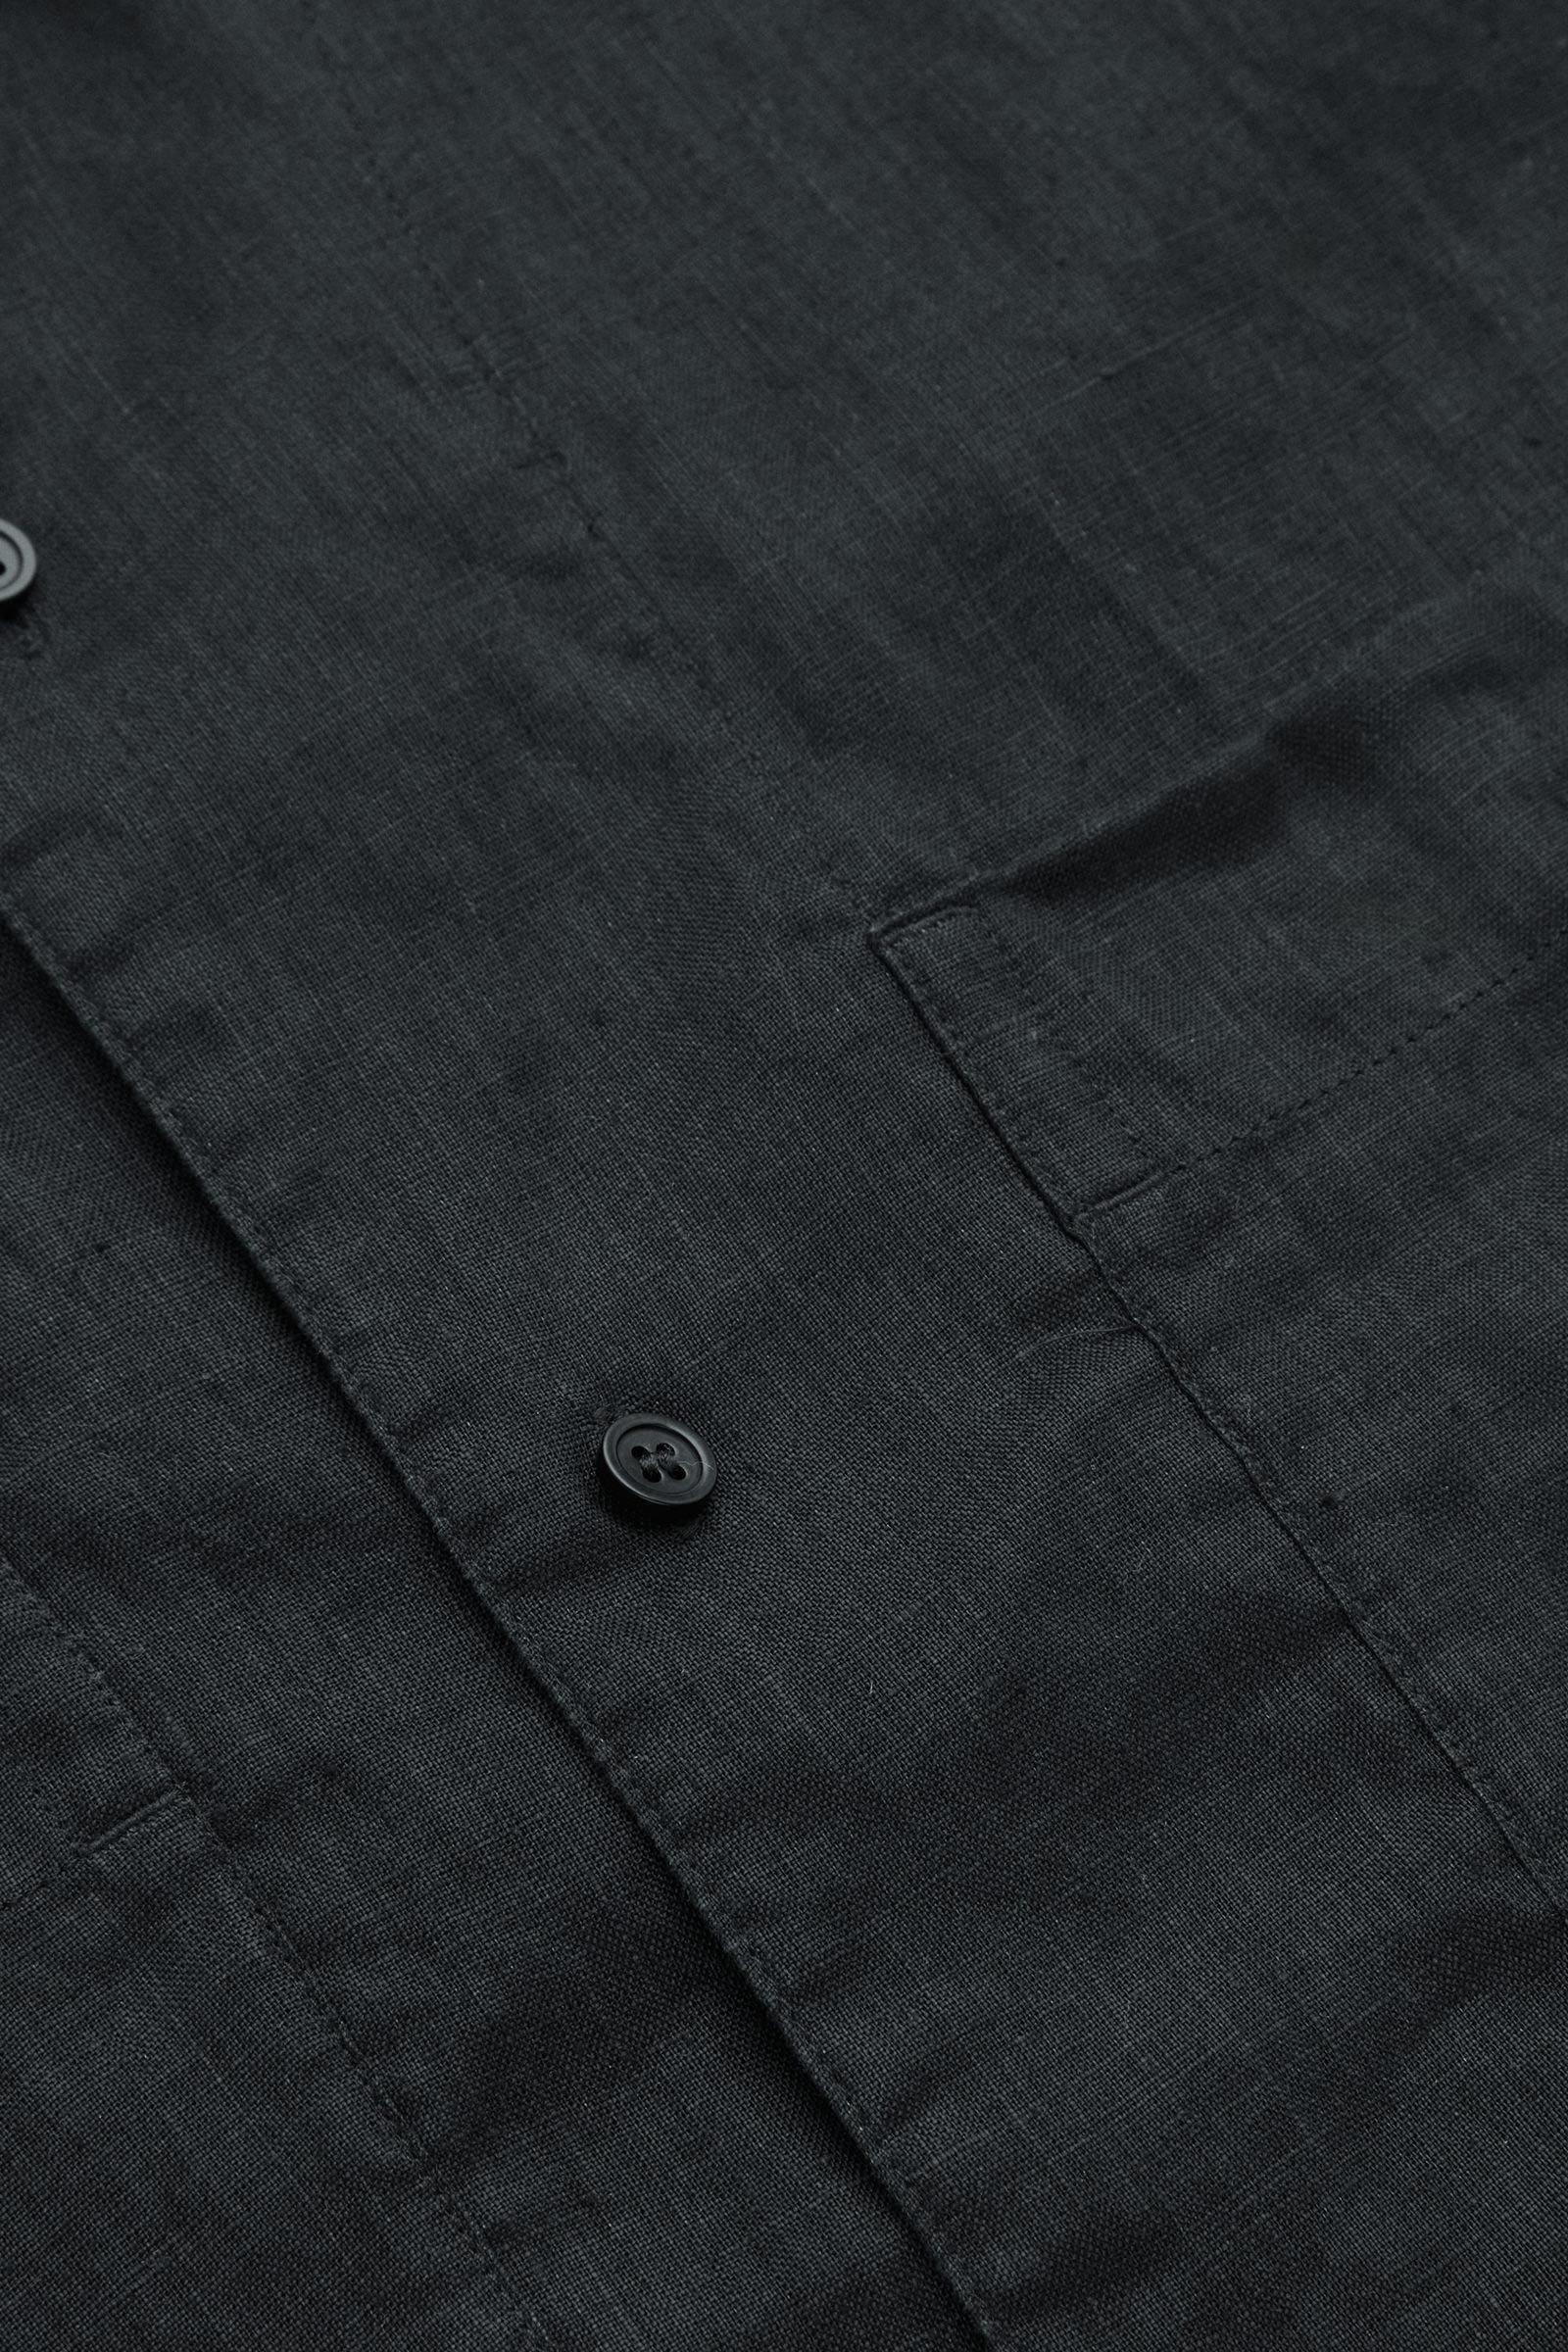 COS 캠프 칼라 쇼트 슬리브 셔츠의 블랙컬러 Detail입니다.